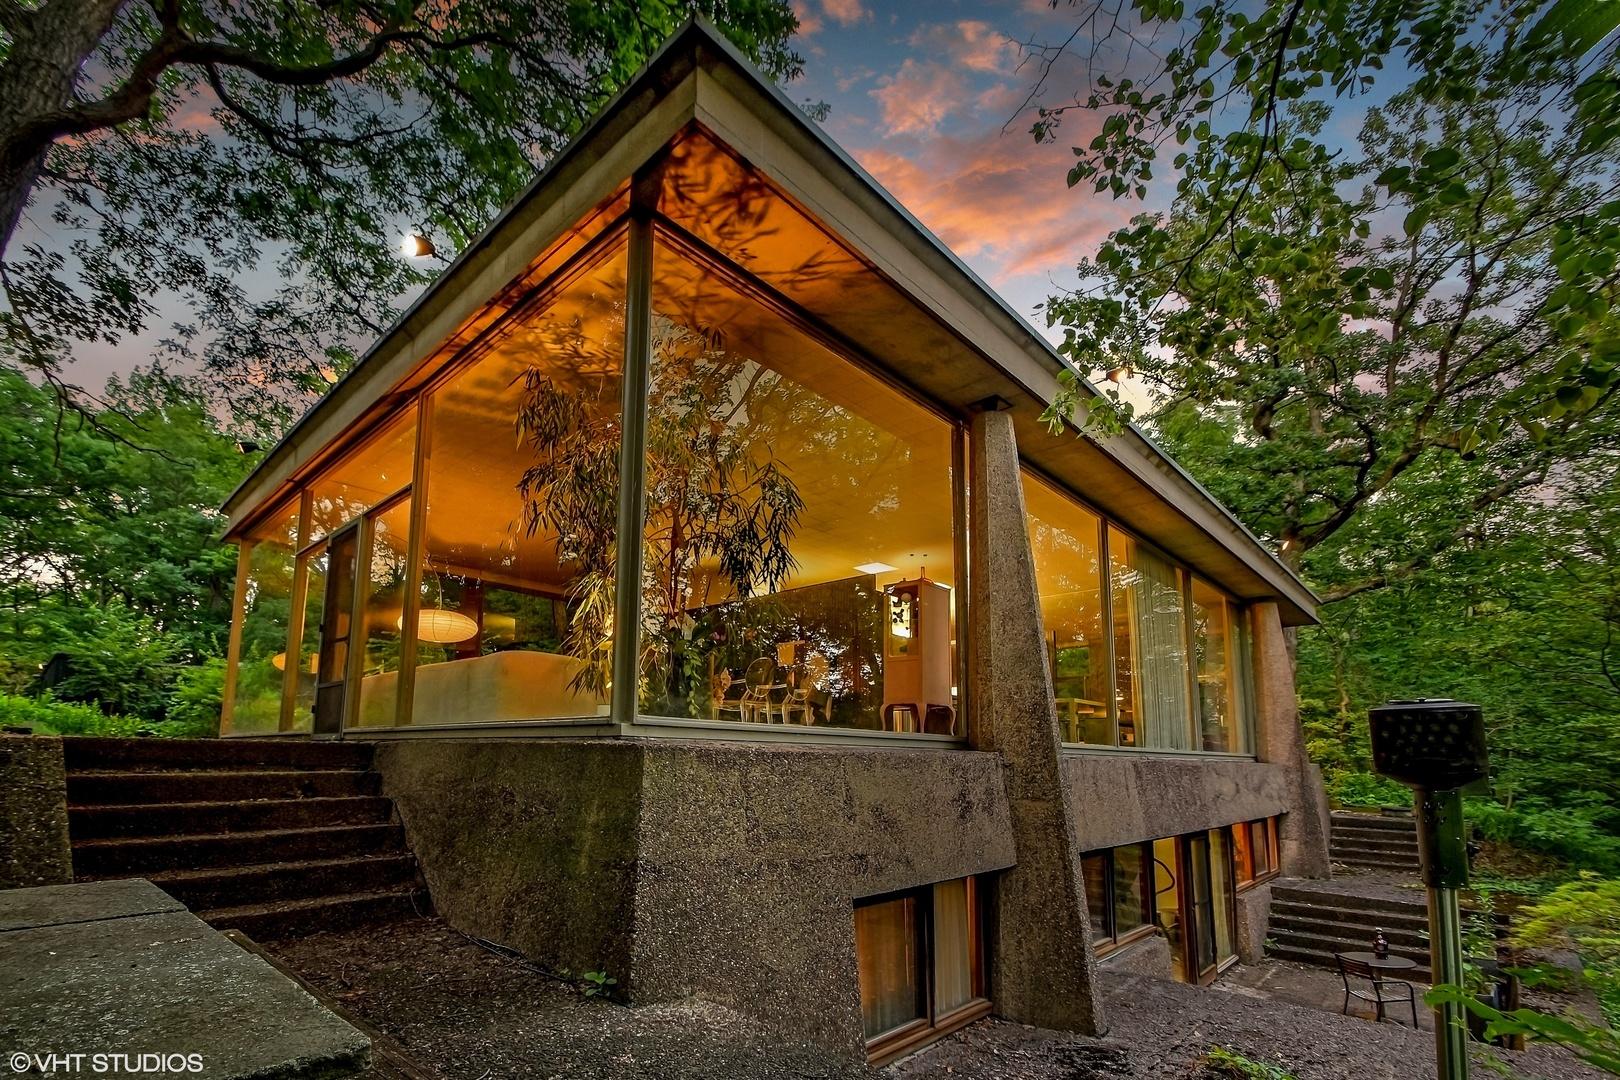 Modern Homes for Sale - Modern Illinois on Modern Glass Houses  id=80439